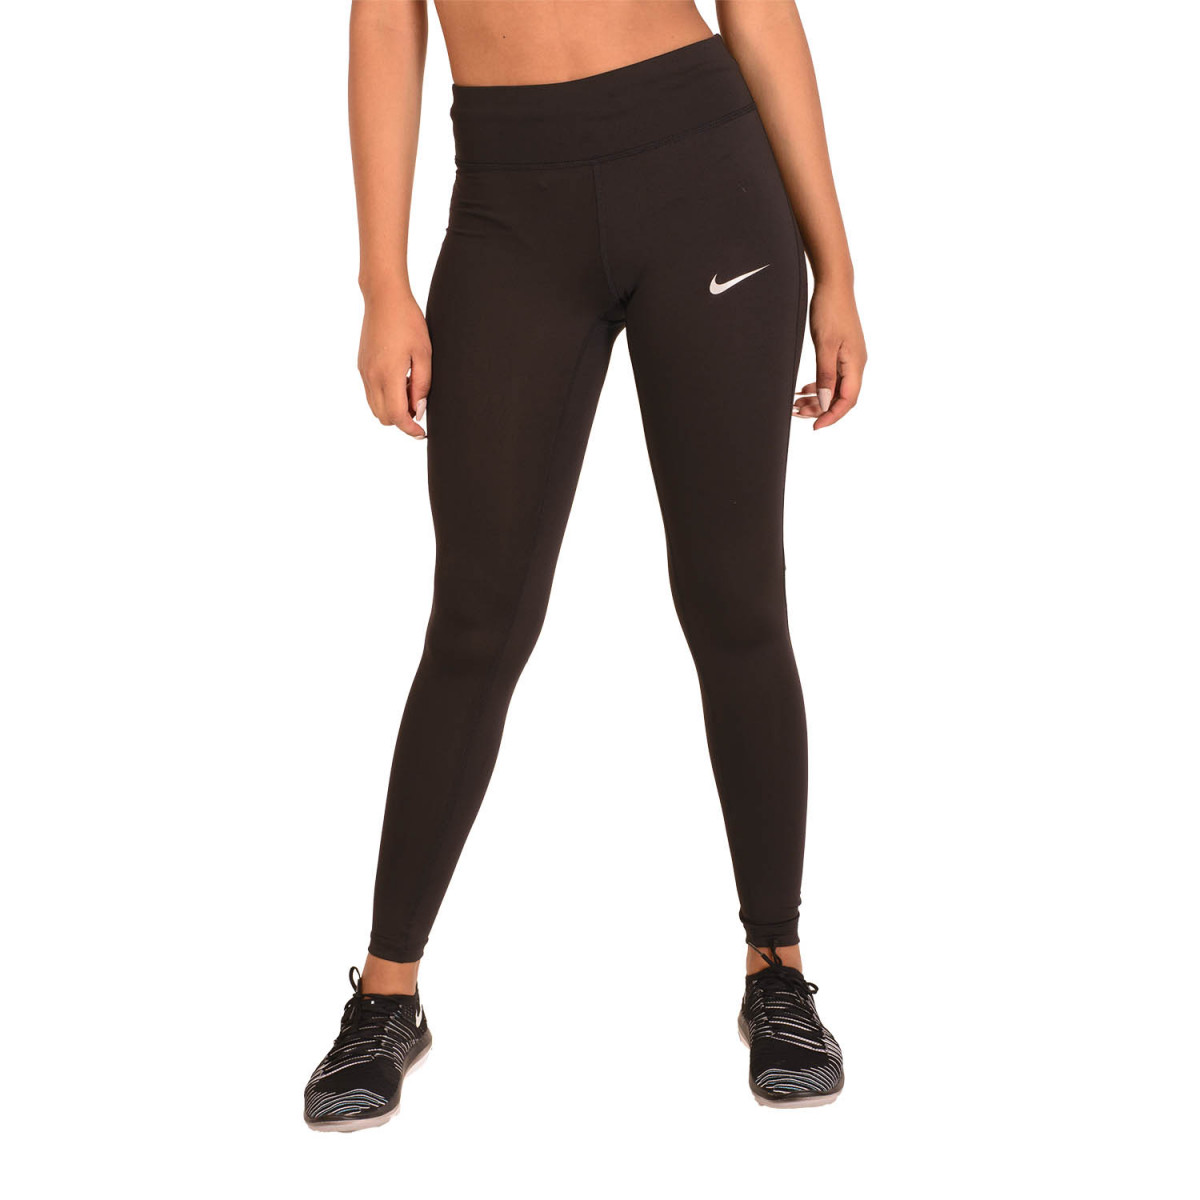 07bf87c02 Calza Nike Power Essential - Calzas - Indumentaria - Mujer